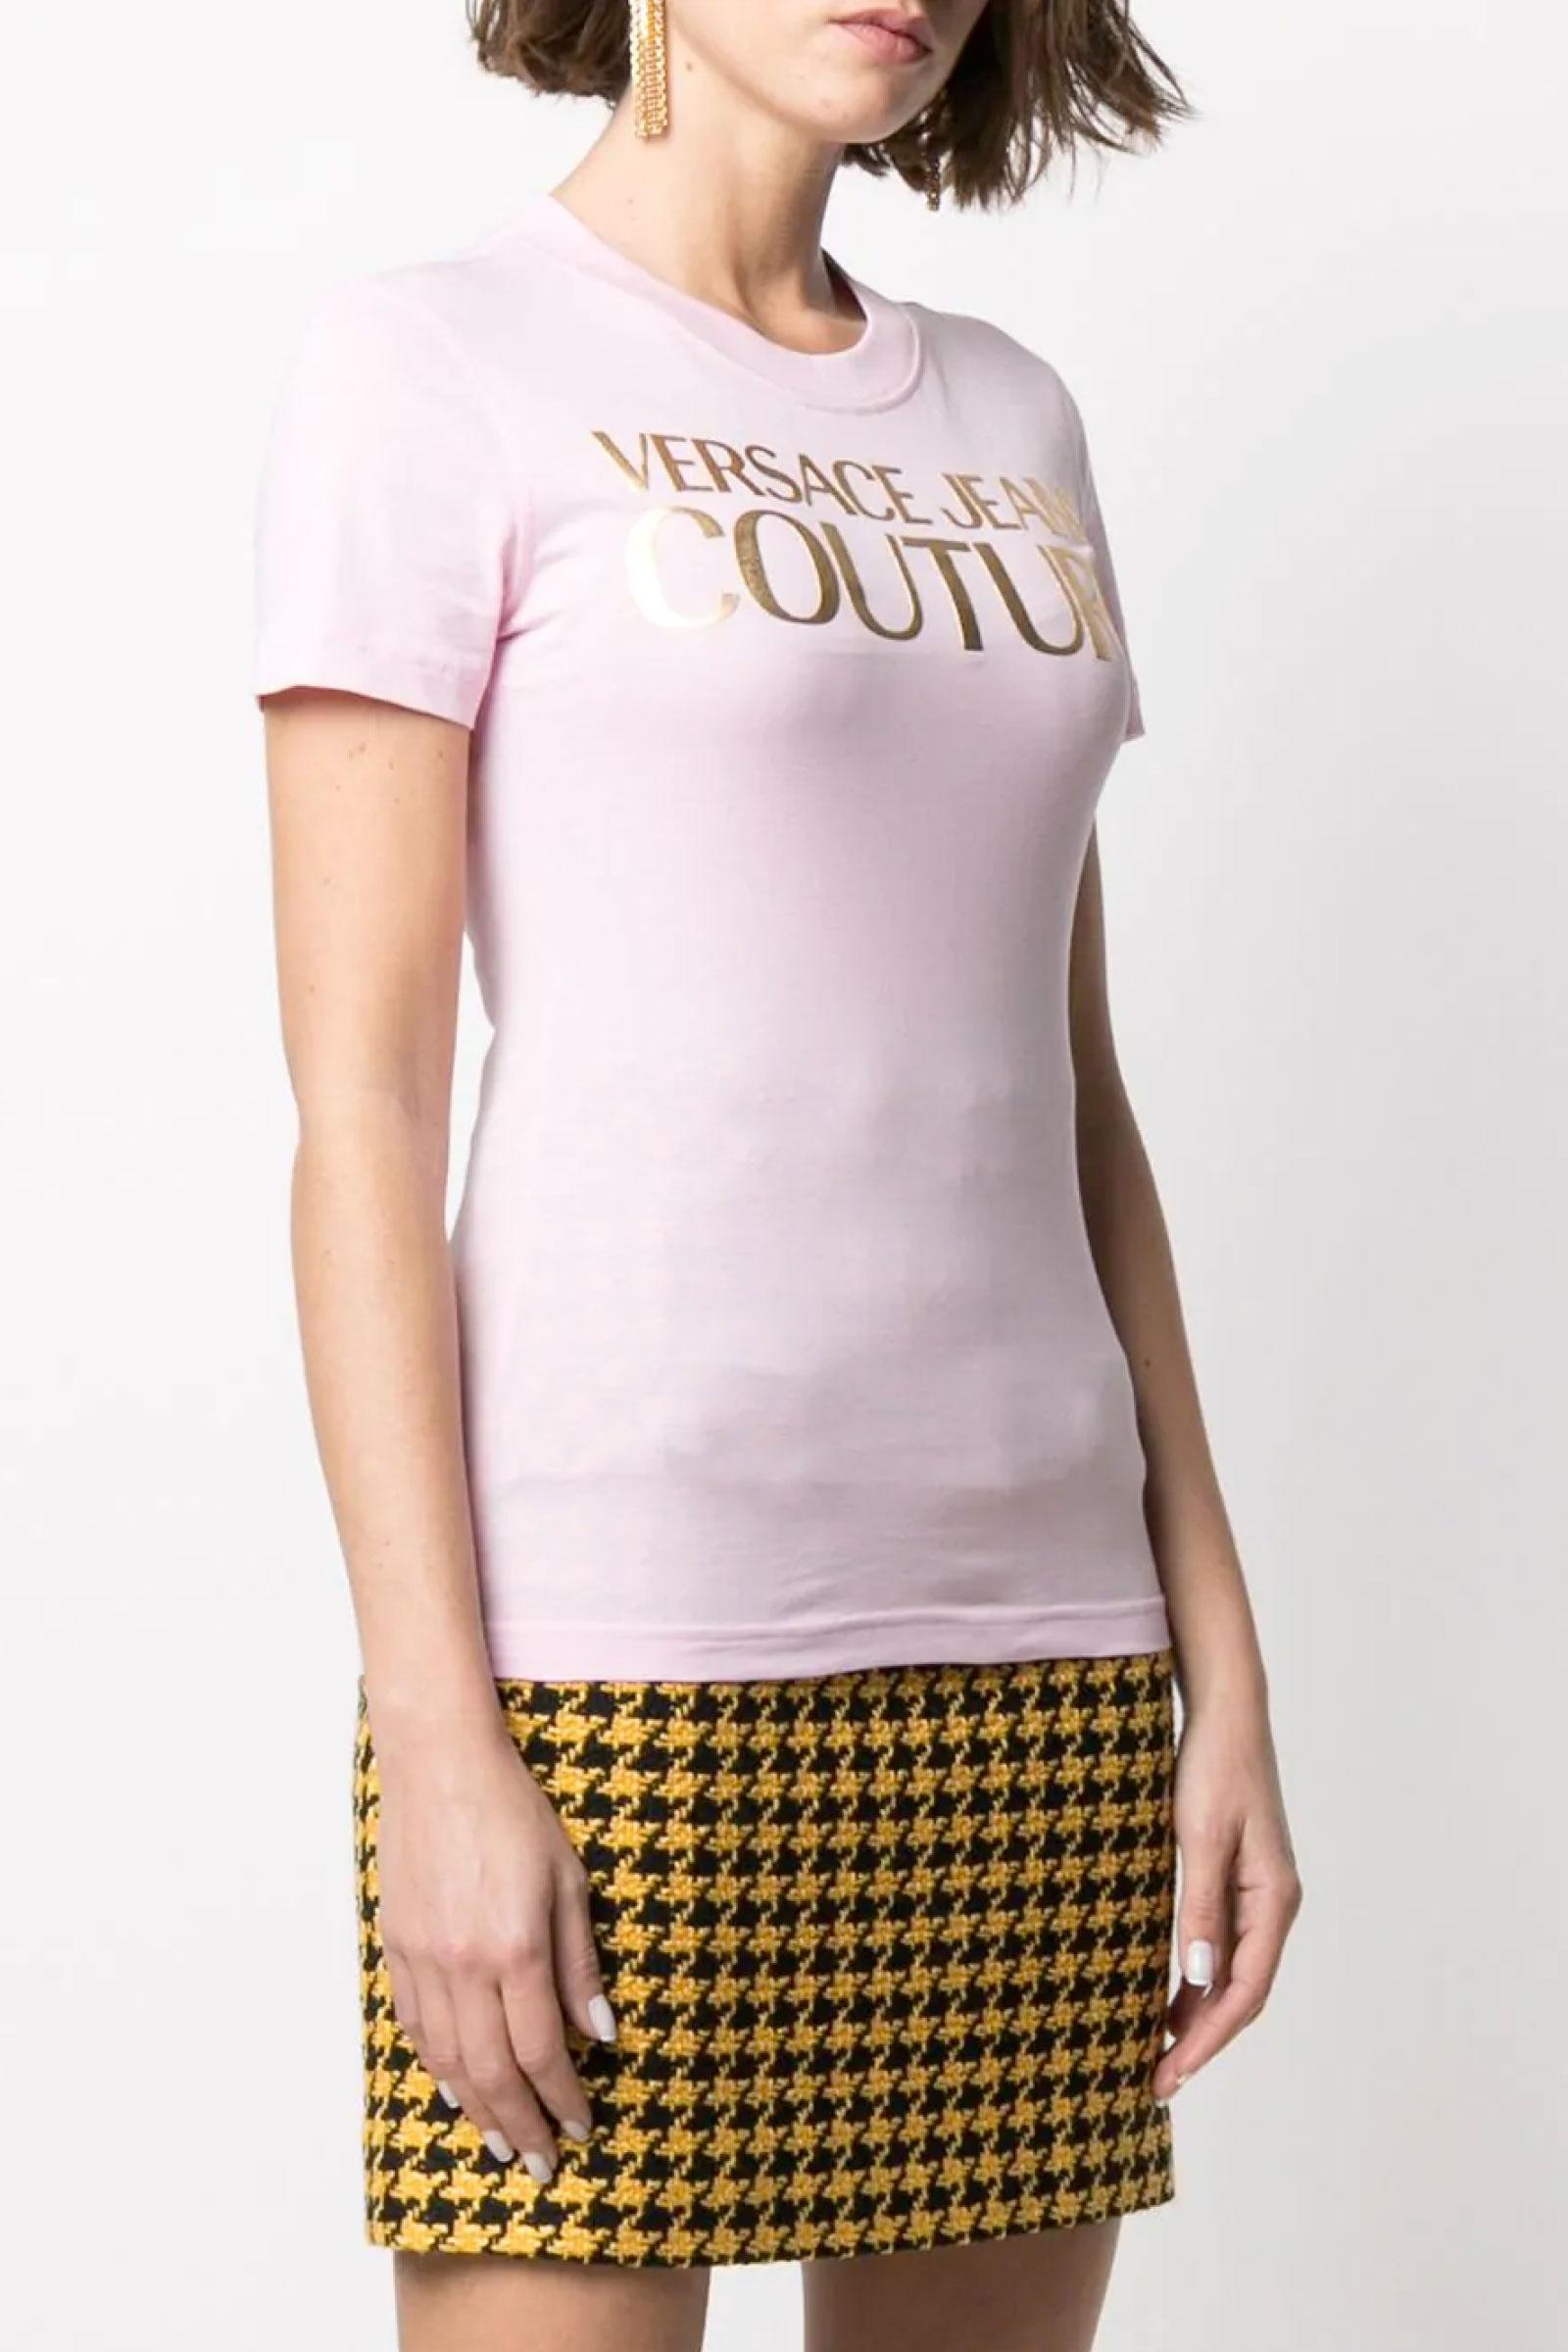 VERSACE JEANS COUTURE T-Shirt Donna VERSACE JEANS COUTURE   T-Shirt   B2HWA7TB30319402